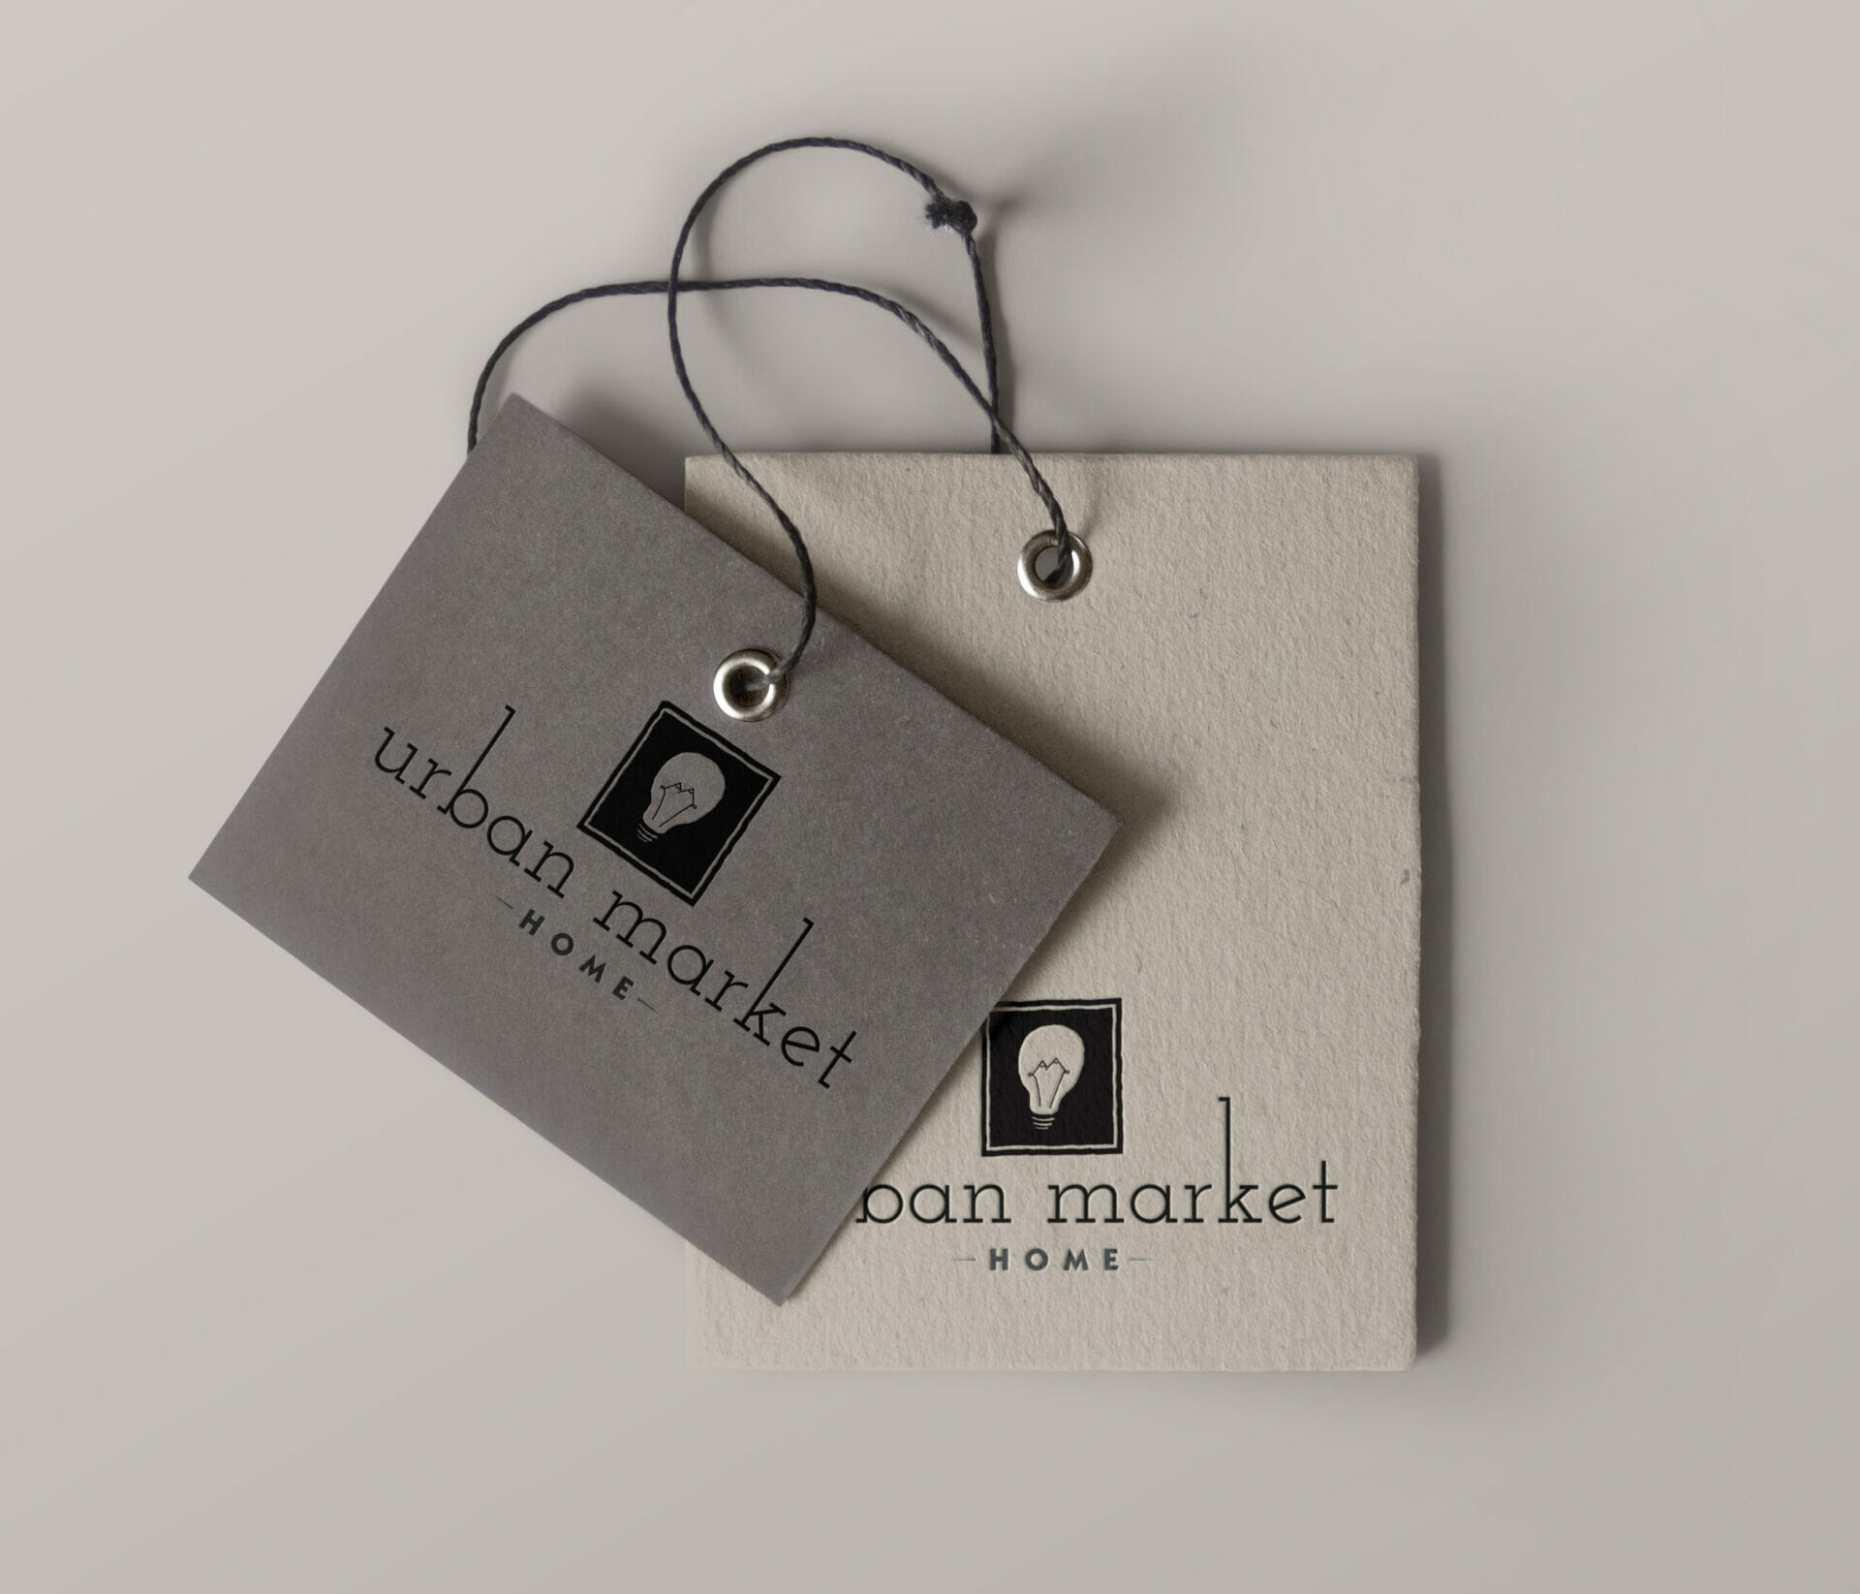 Urban Market labels